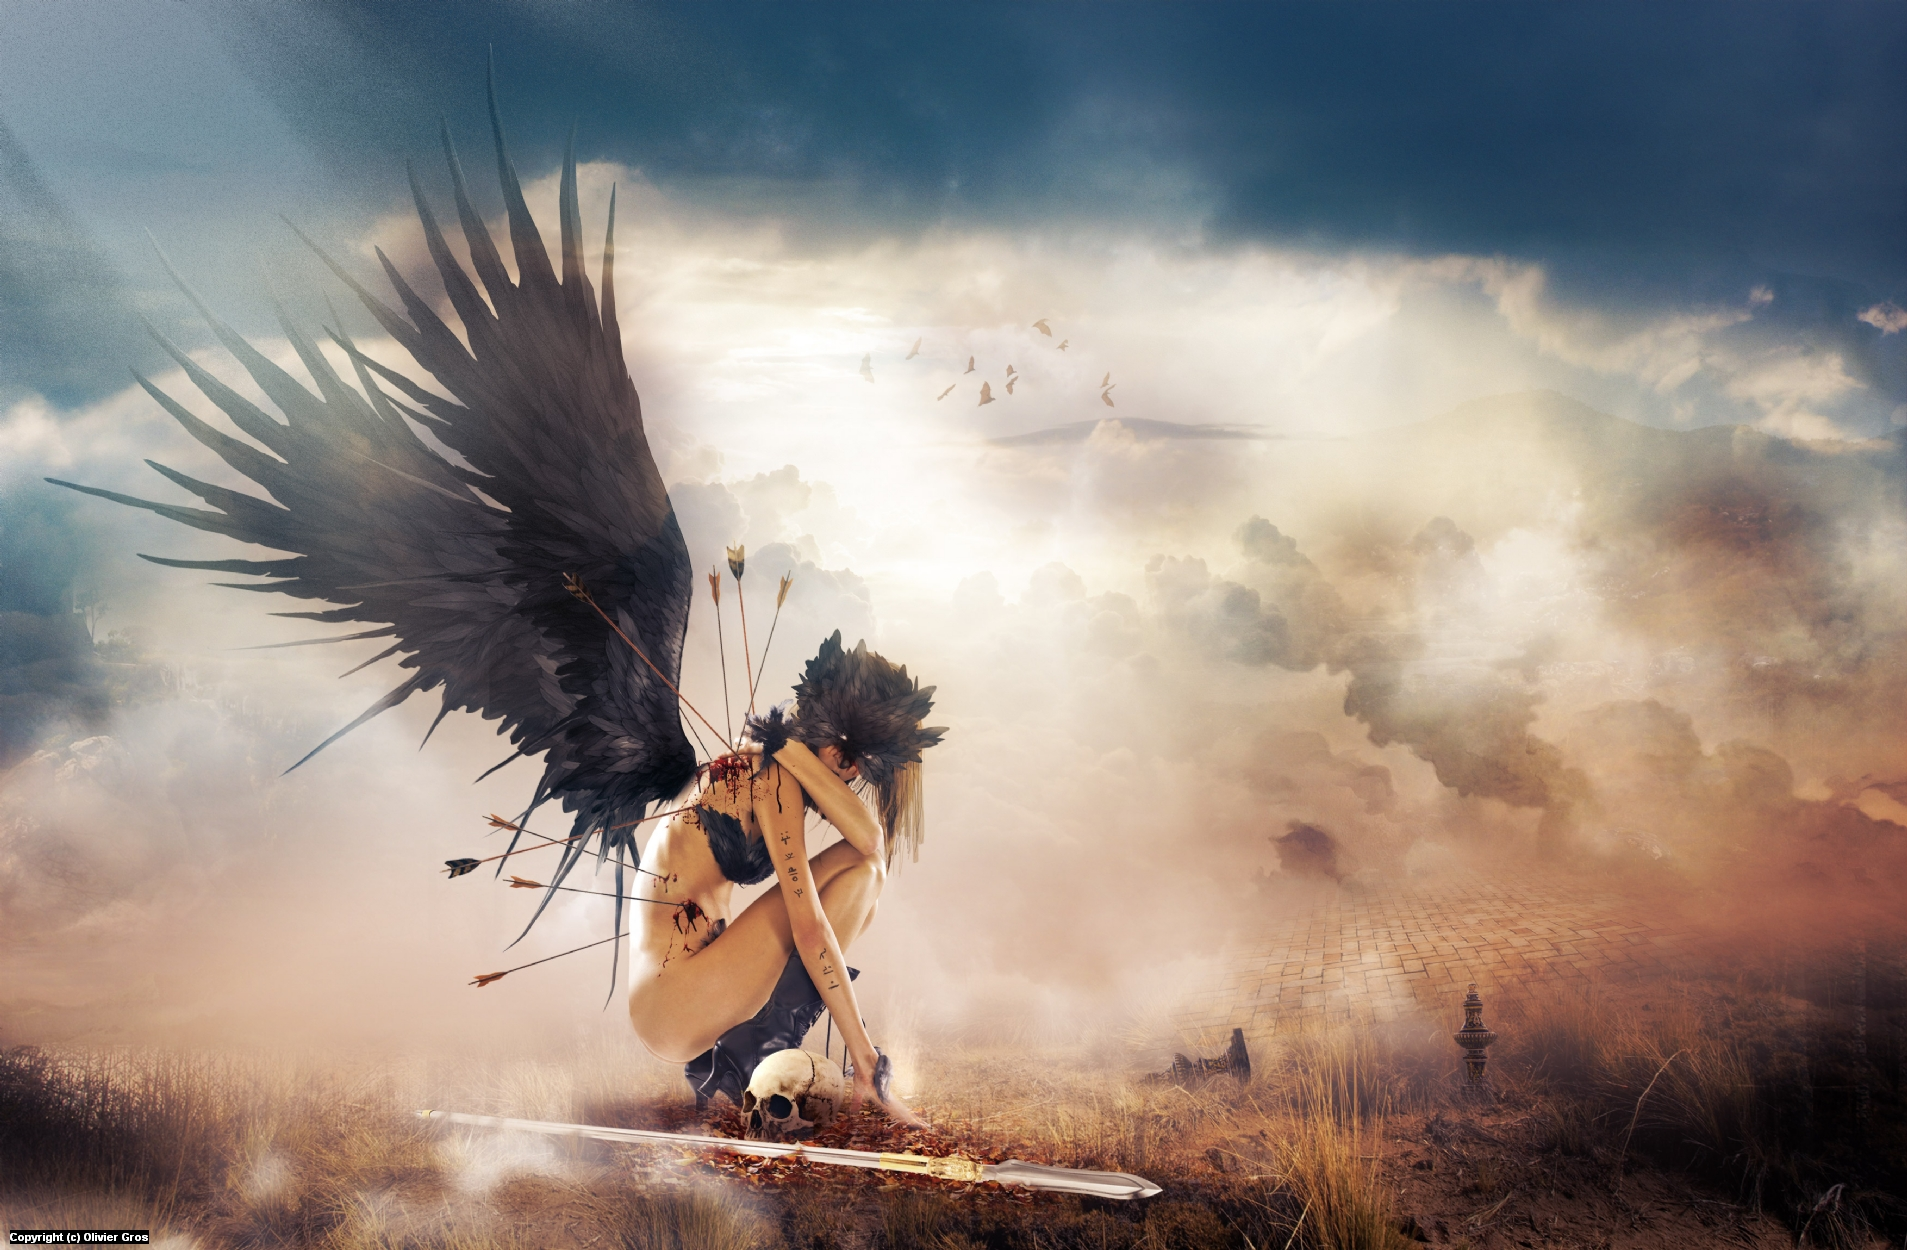 Angel Artwork by Olivier Gros